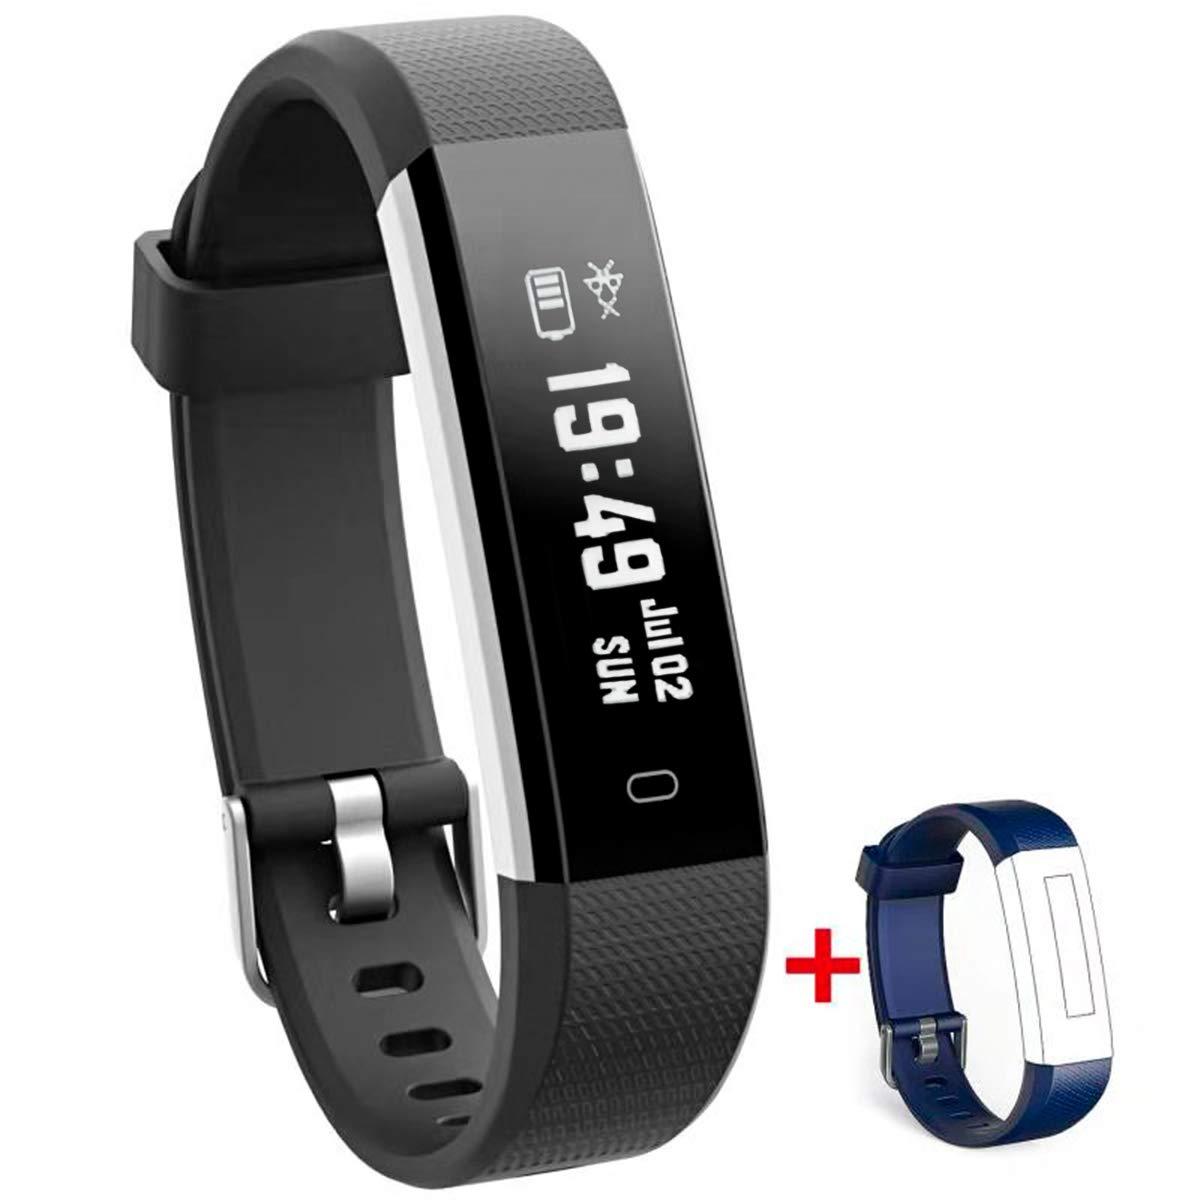 Nakosite RAY2433 Reloj Podometro Pulsera Mujer Hombre de Actividad Inteligente Fitness Tracker, Contador de Calorías… 1